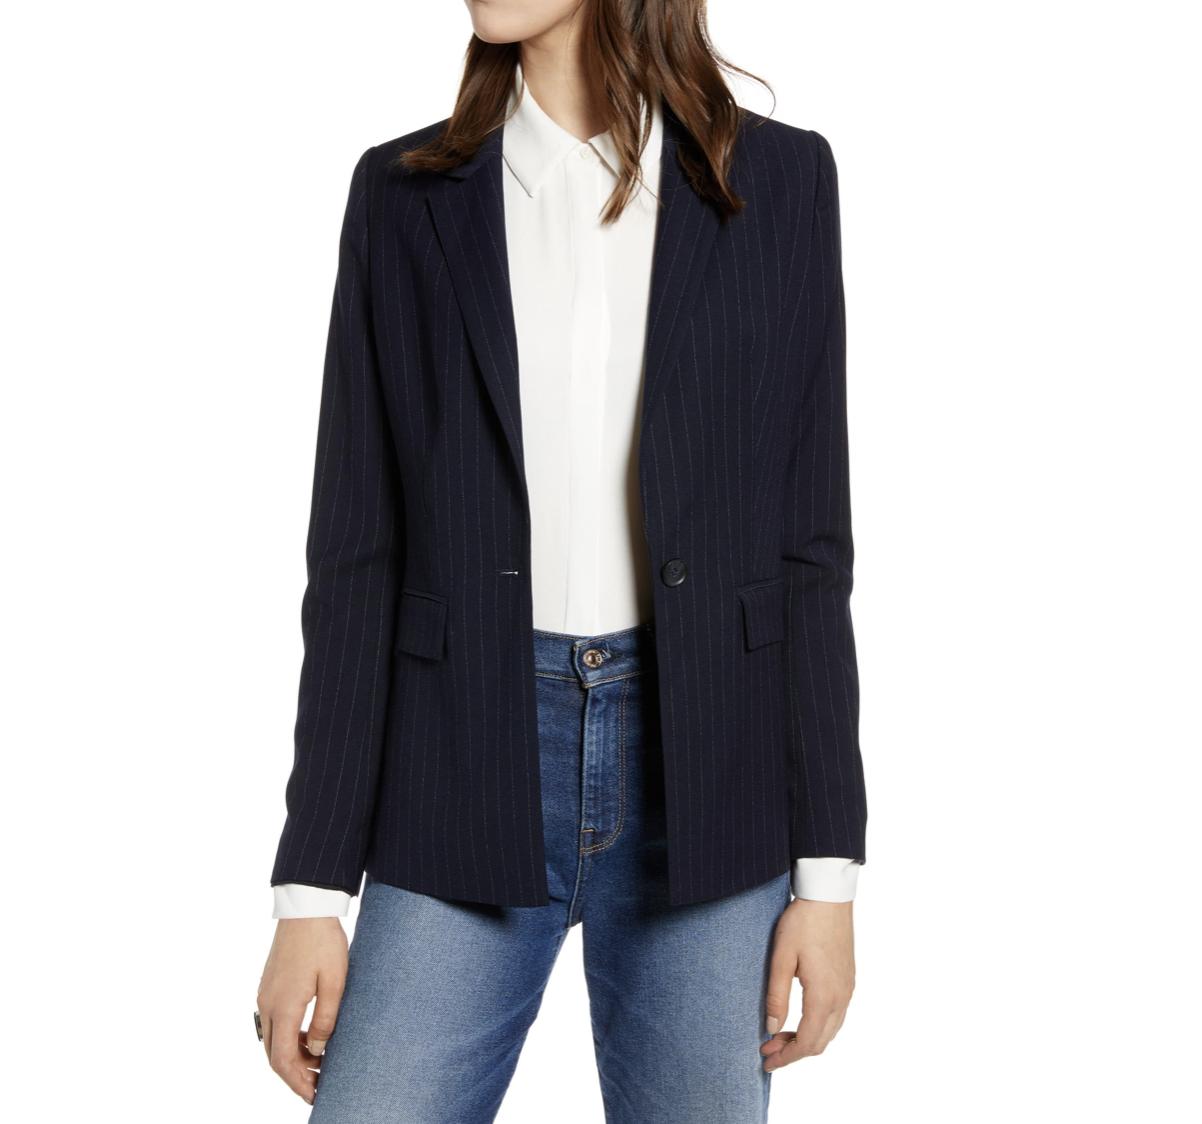 Navy Blazer | Nordstrom Anniversary Sale 2019 | A Demure Life Fashion Blog